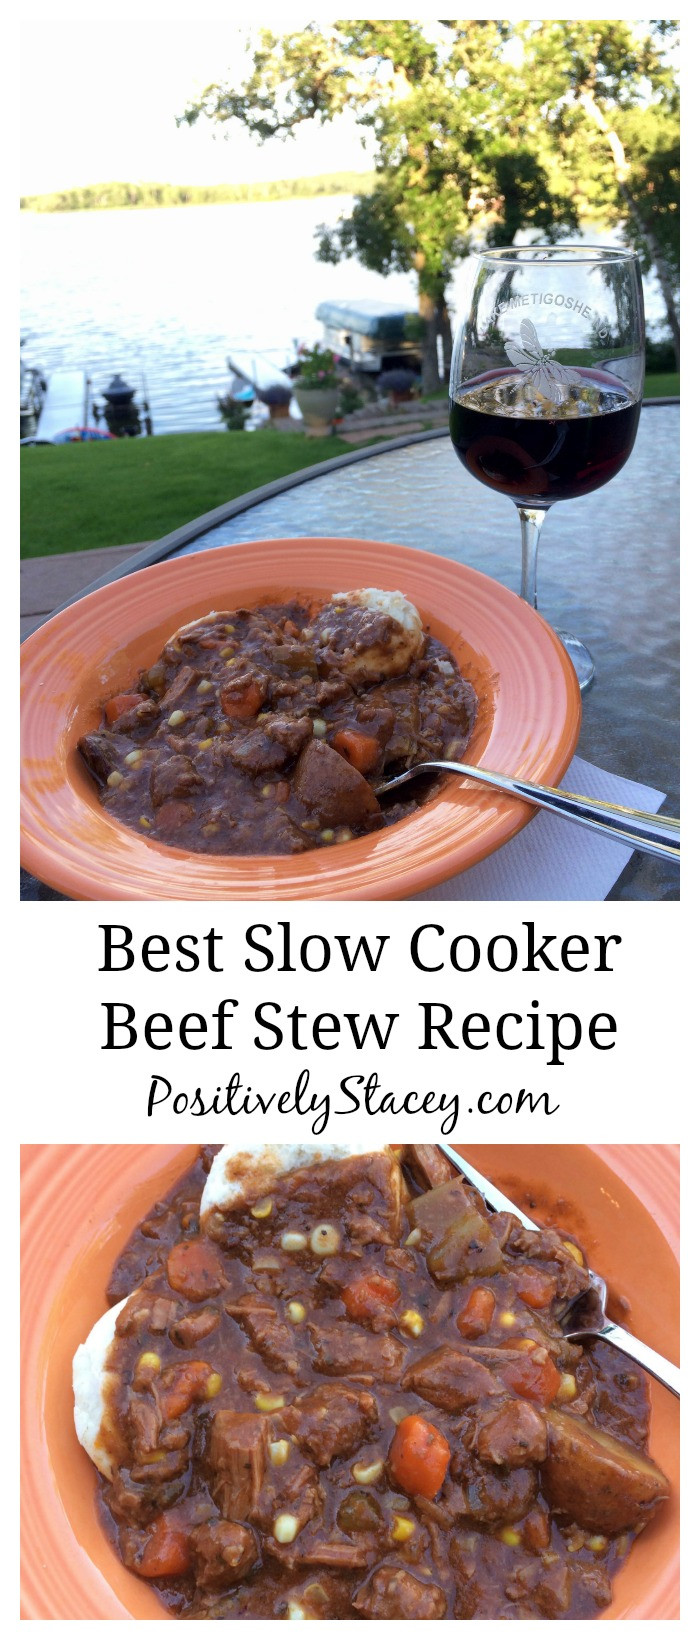 Best Crockpot Beef Stew  Best Slow Cooker Beef Stew Recipe Positively Stacey